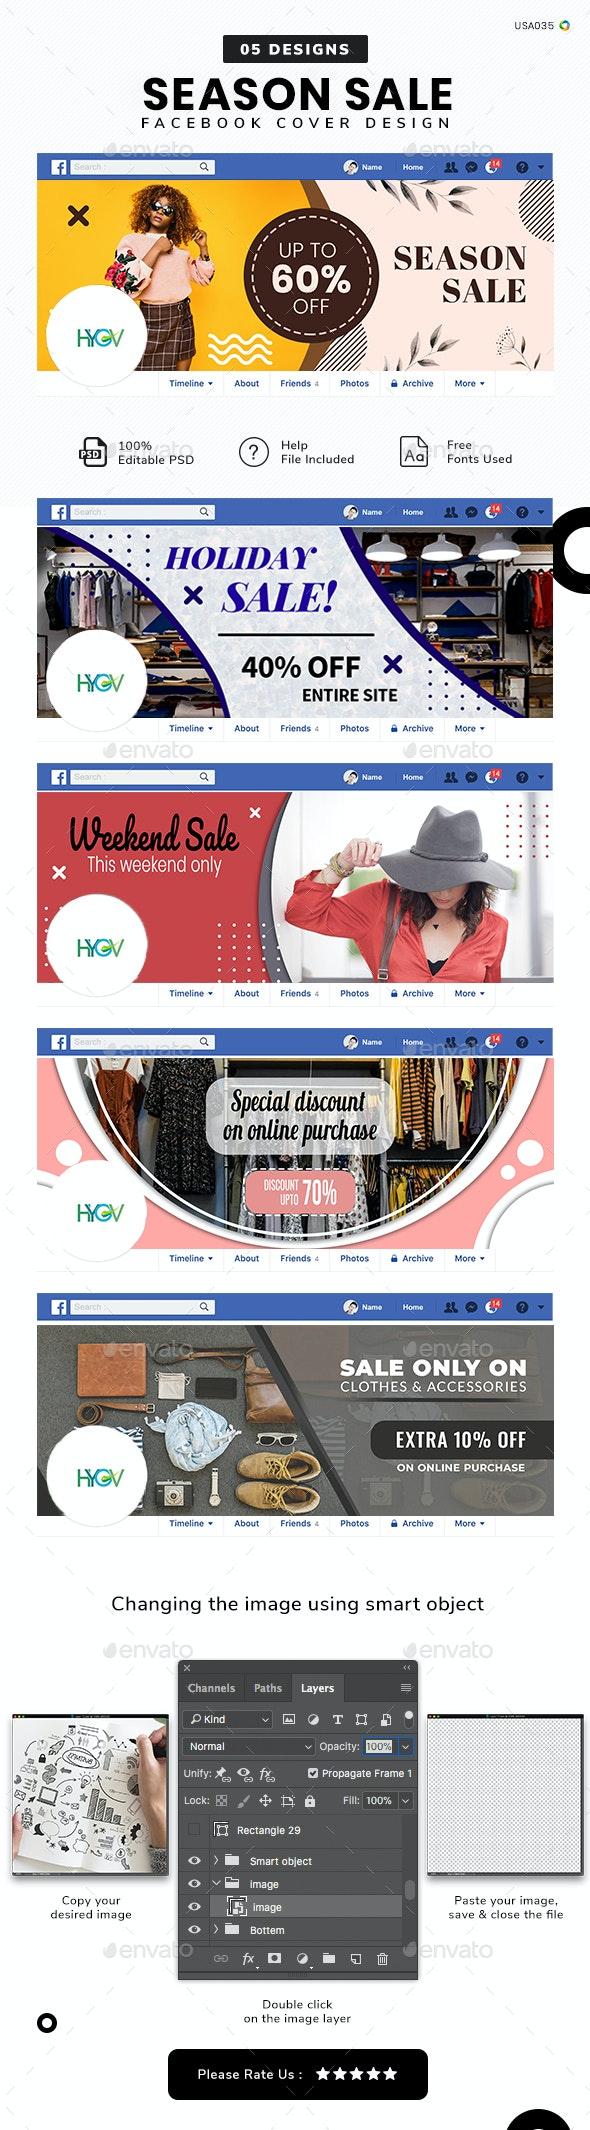 Season Sale Facebook Cover Set - 05 Designs - Facebook Timeline Covers Social Media